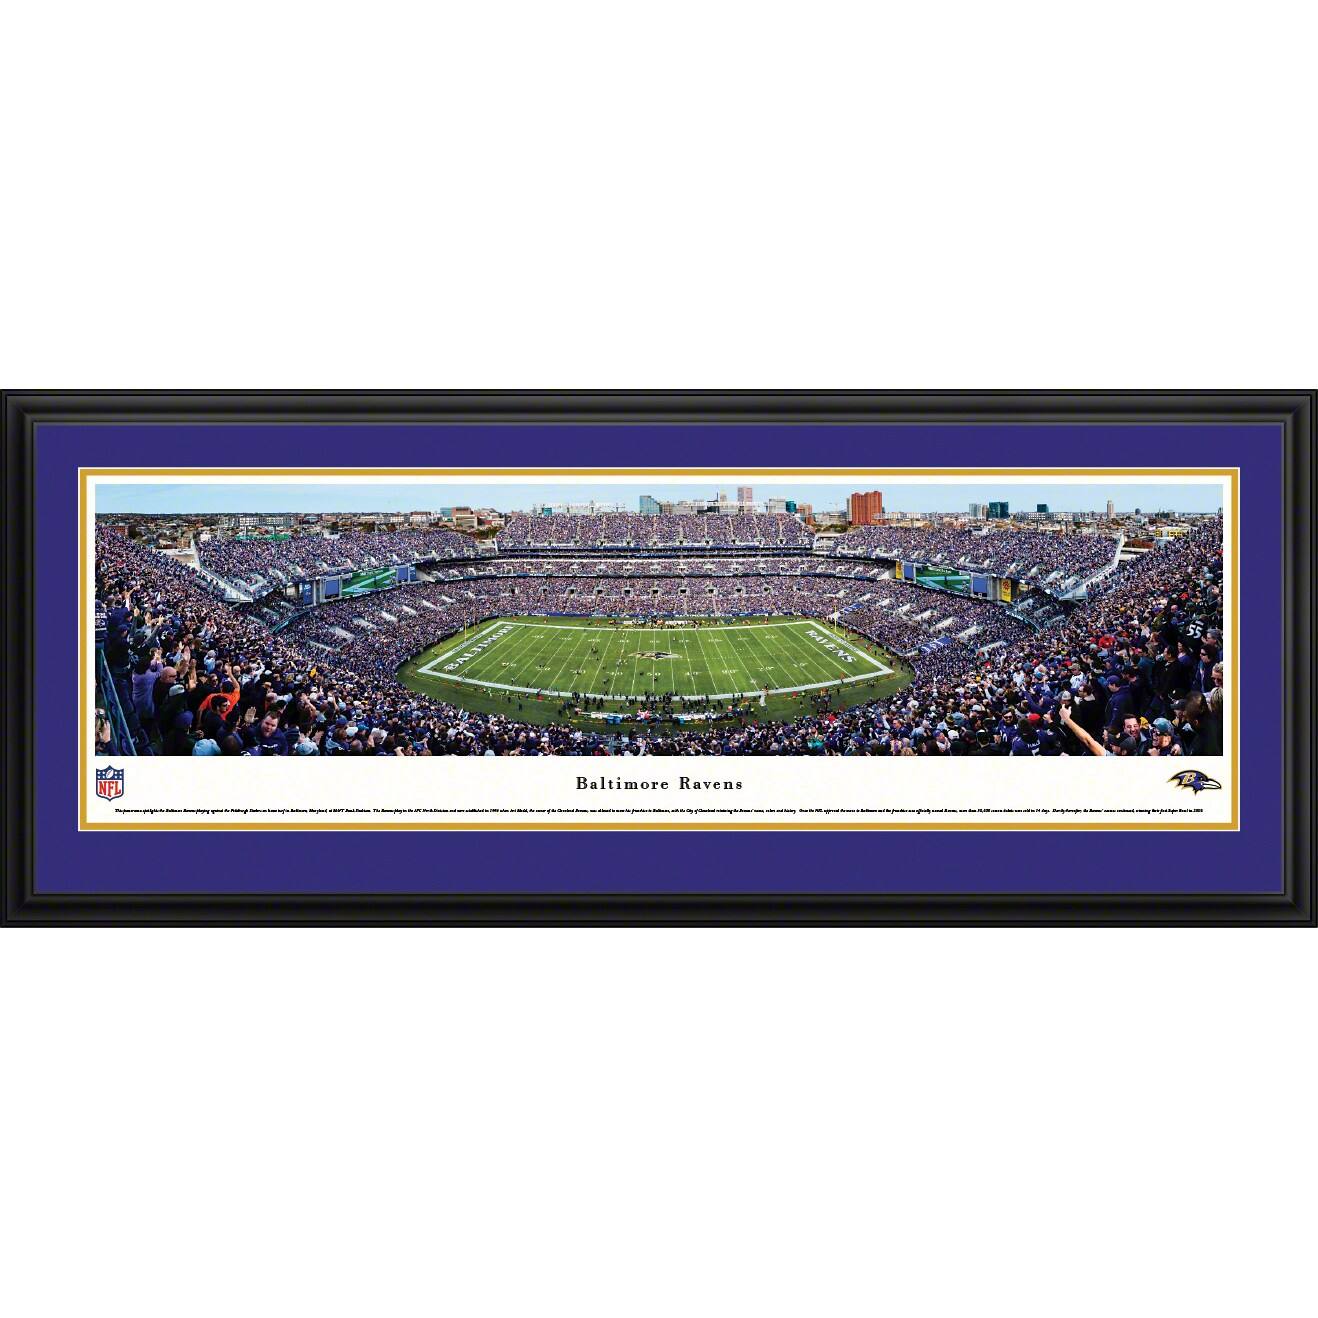 "Baltimore Ravens 18"" x 44"" Deluxe Frame Panoramic Photo"